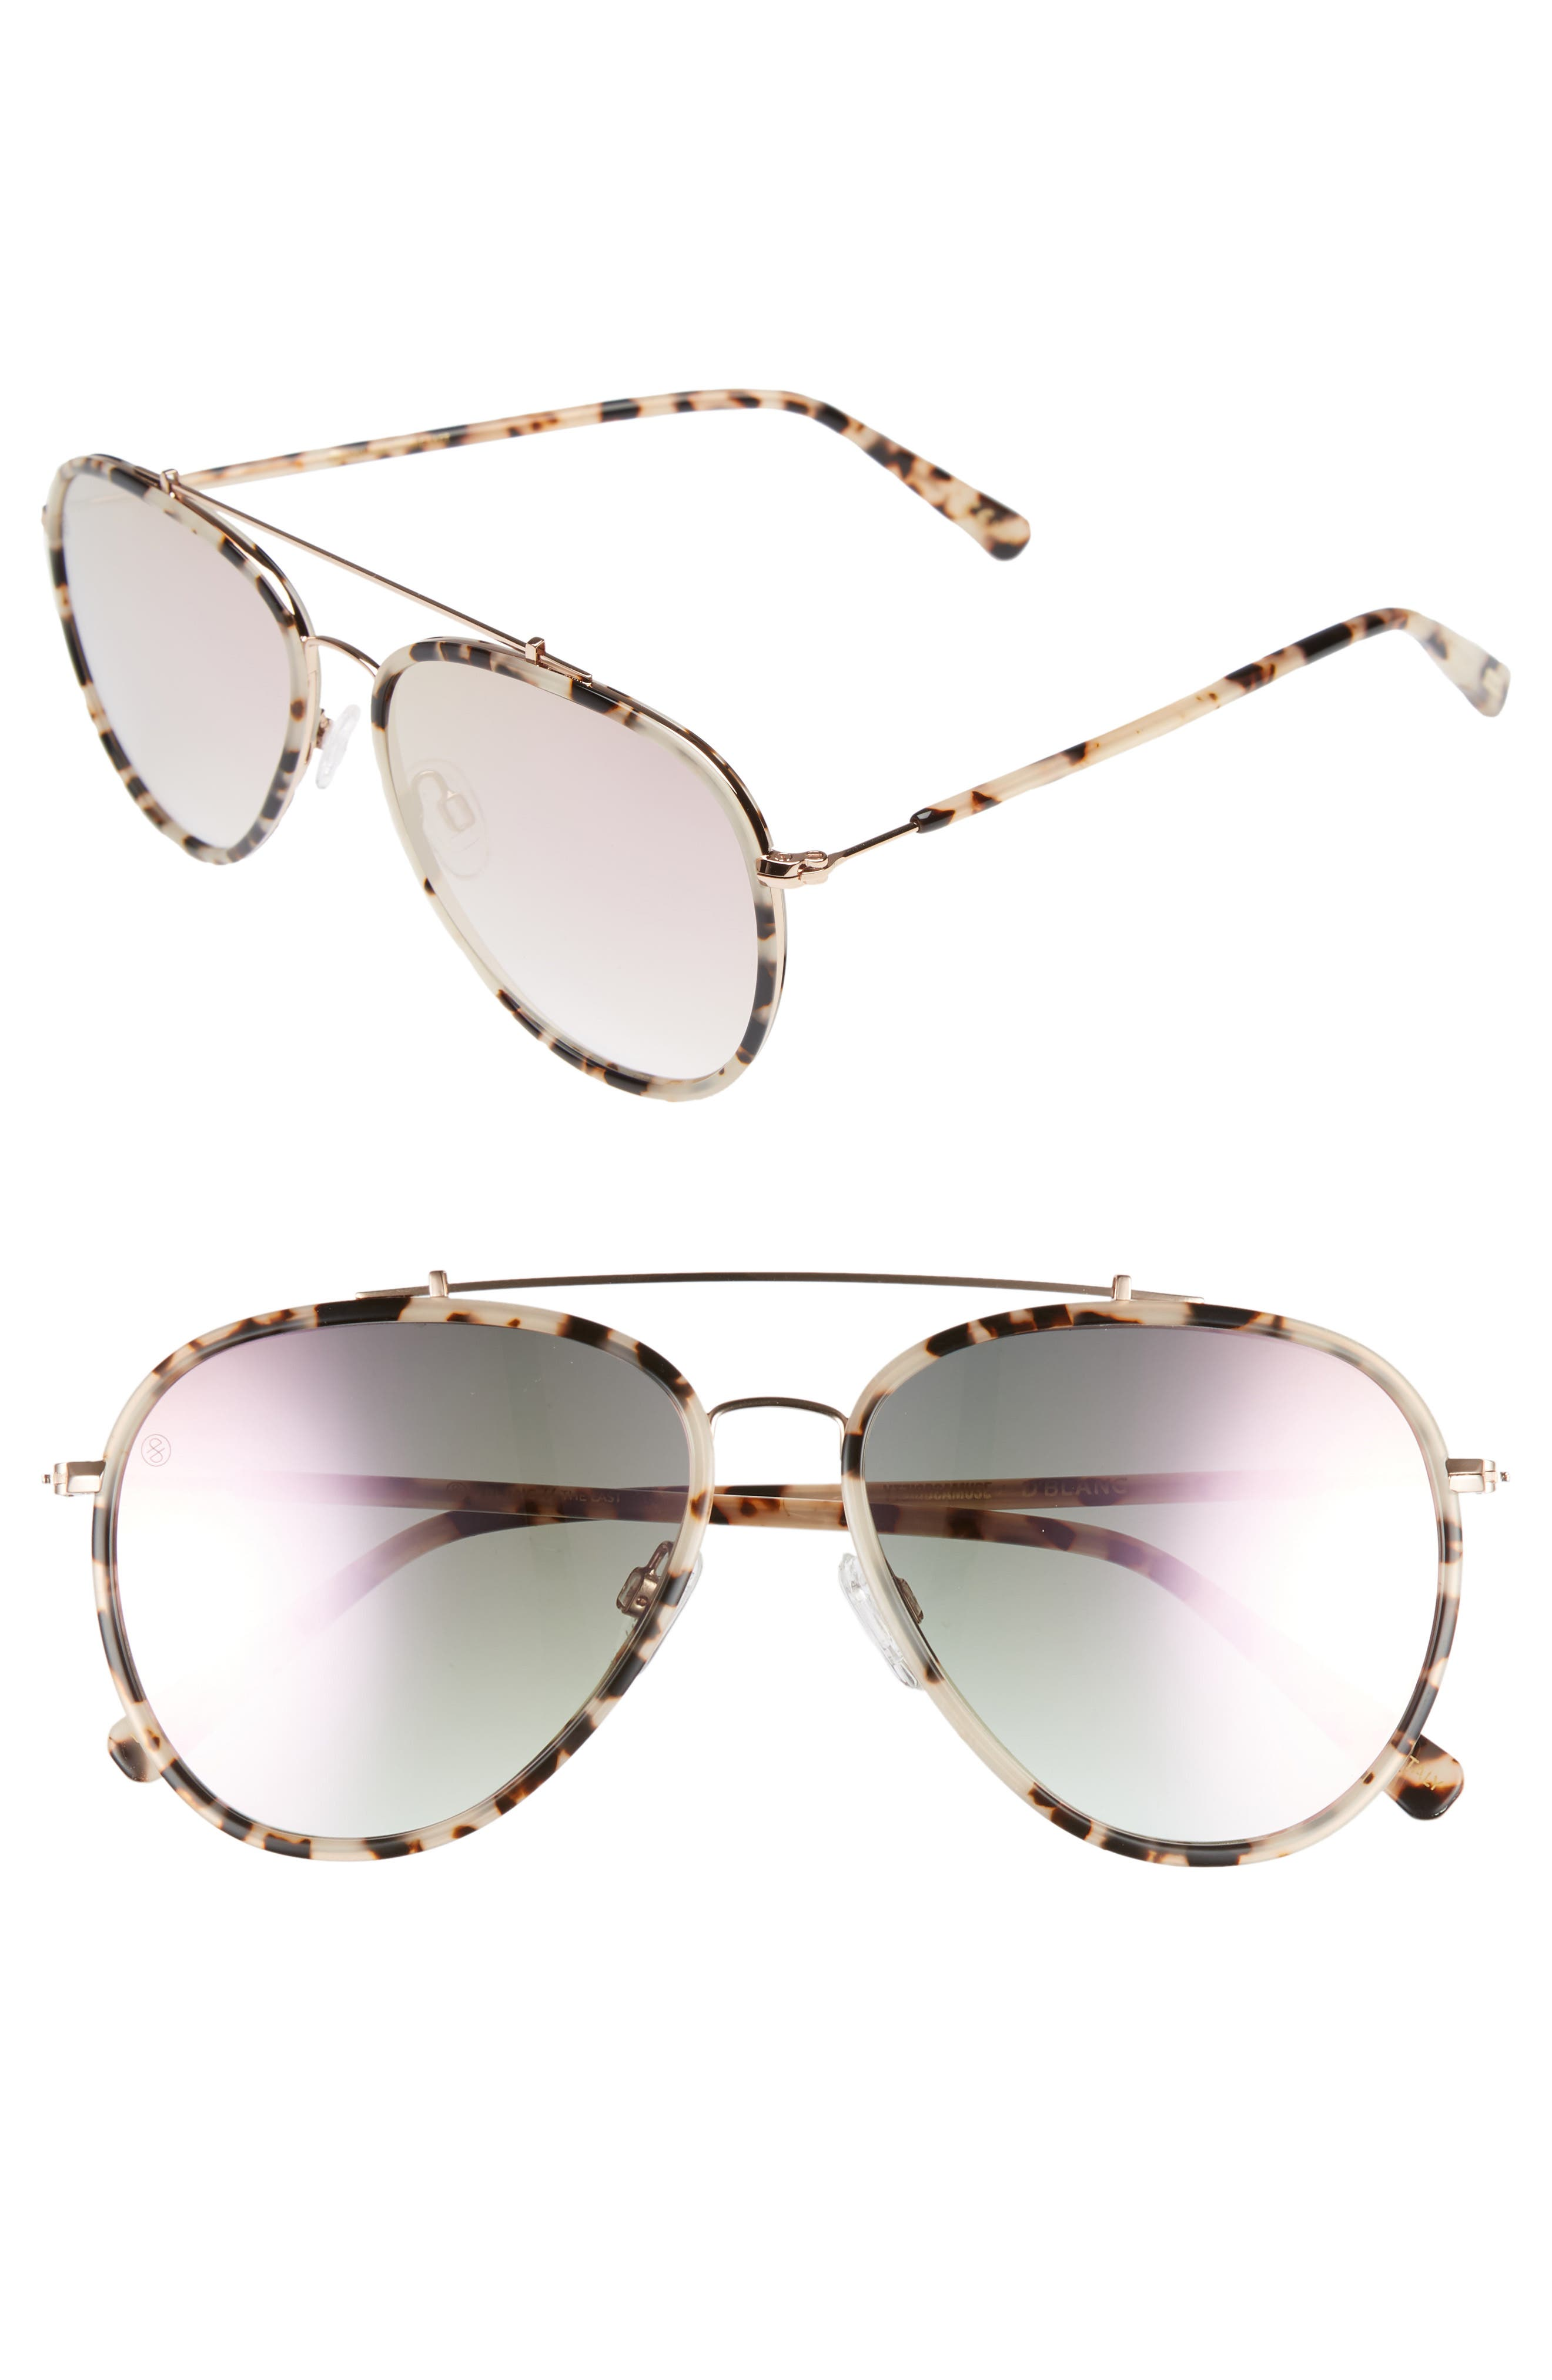 D'BLANC The Last 57mm Aviator Sunglasses,                         Main,                         color, 200